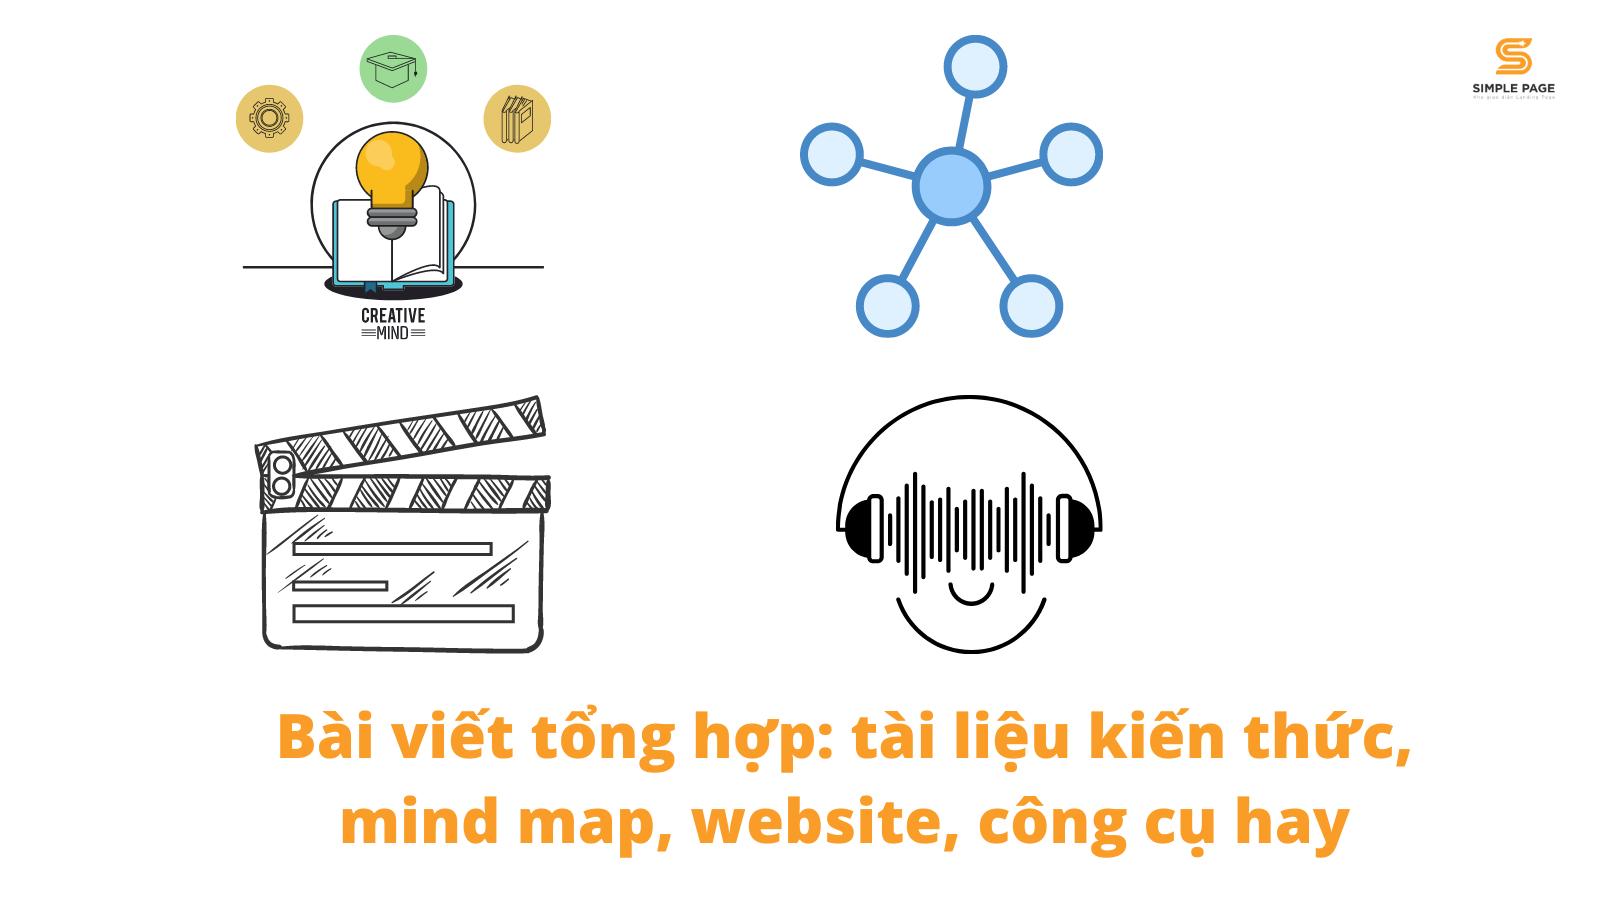 tong-hop-tai-lieu-di-gital-marketing-hay-nhat-cua-simple-page+2